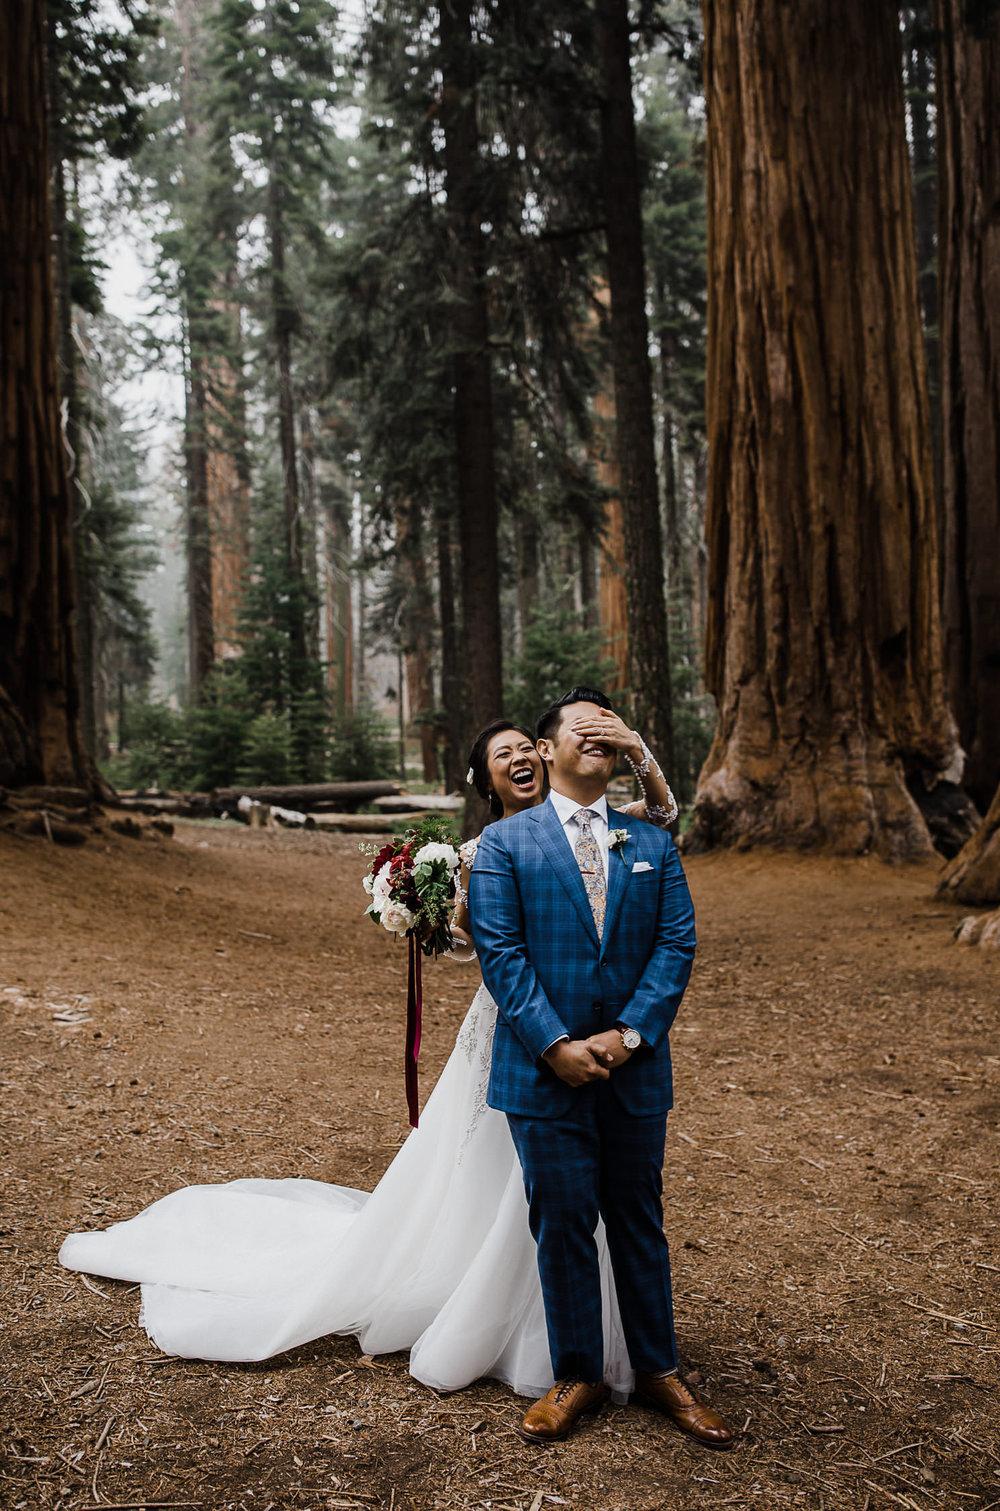 sequoia-national-park-foggy-forest-wedding-elopement-photographer-7 copy.jpg